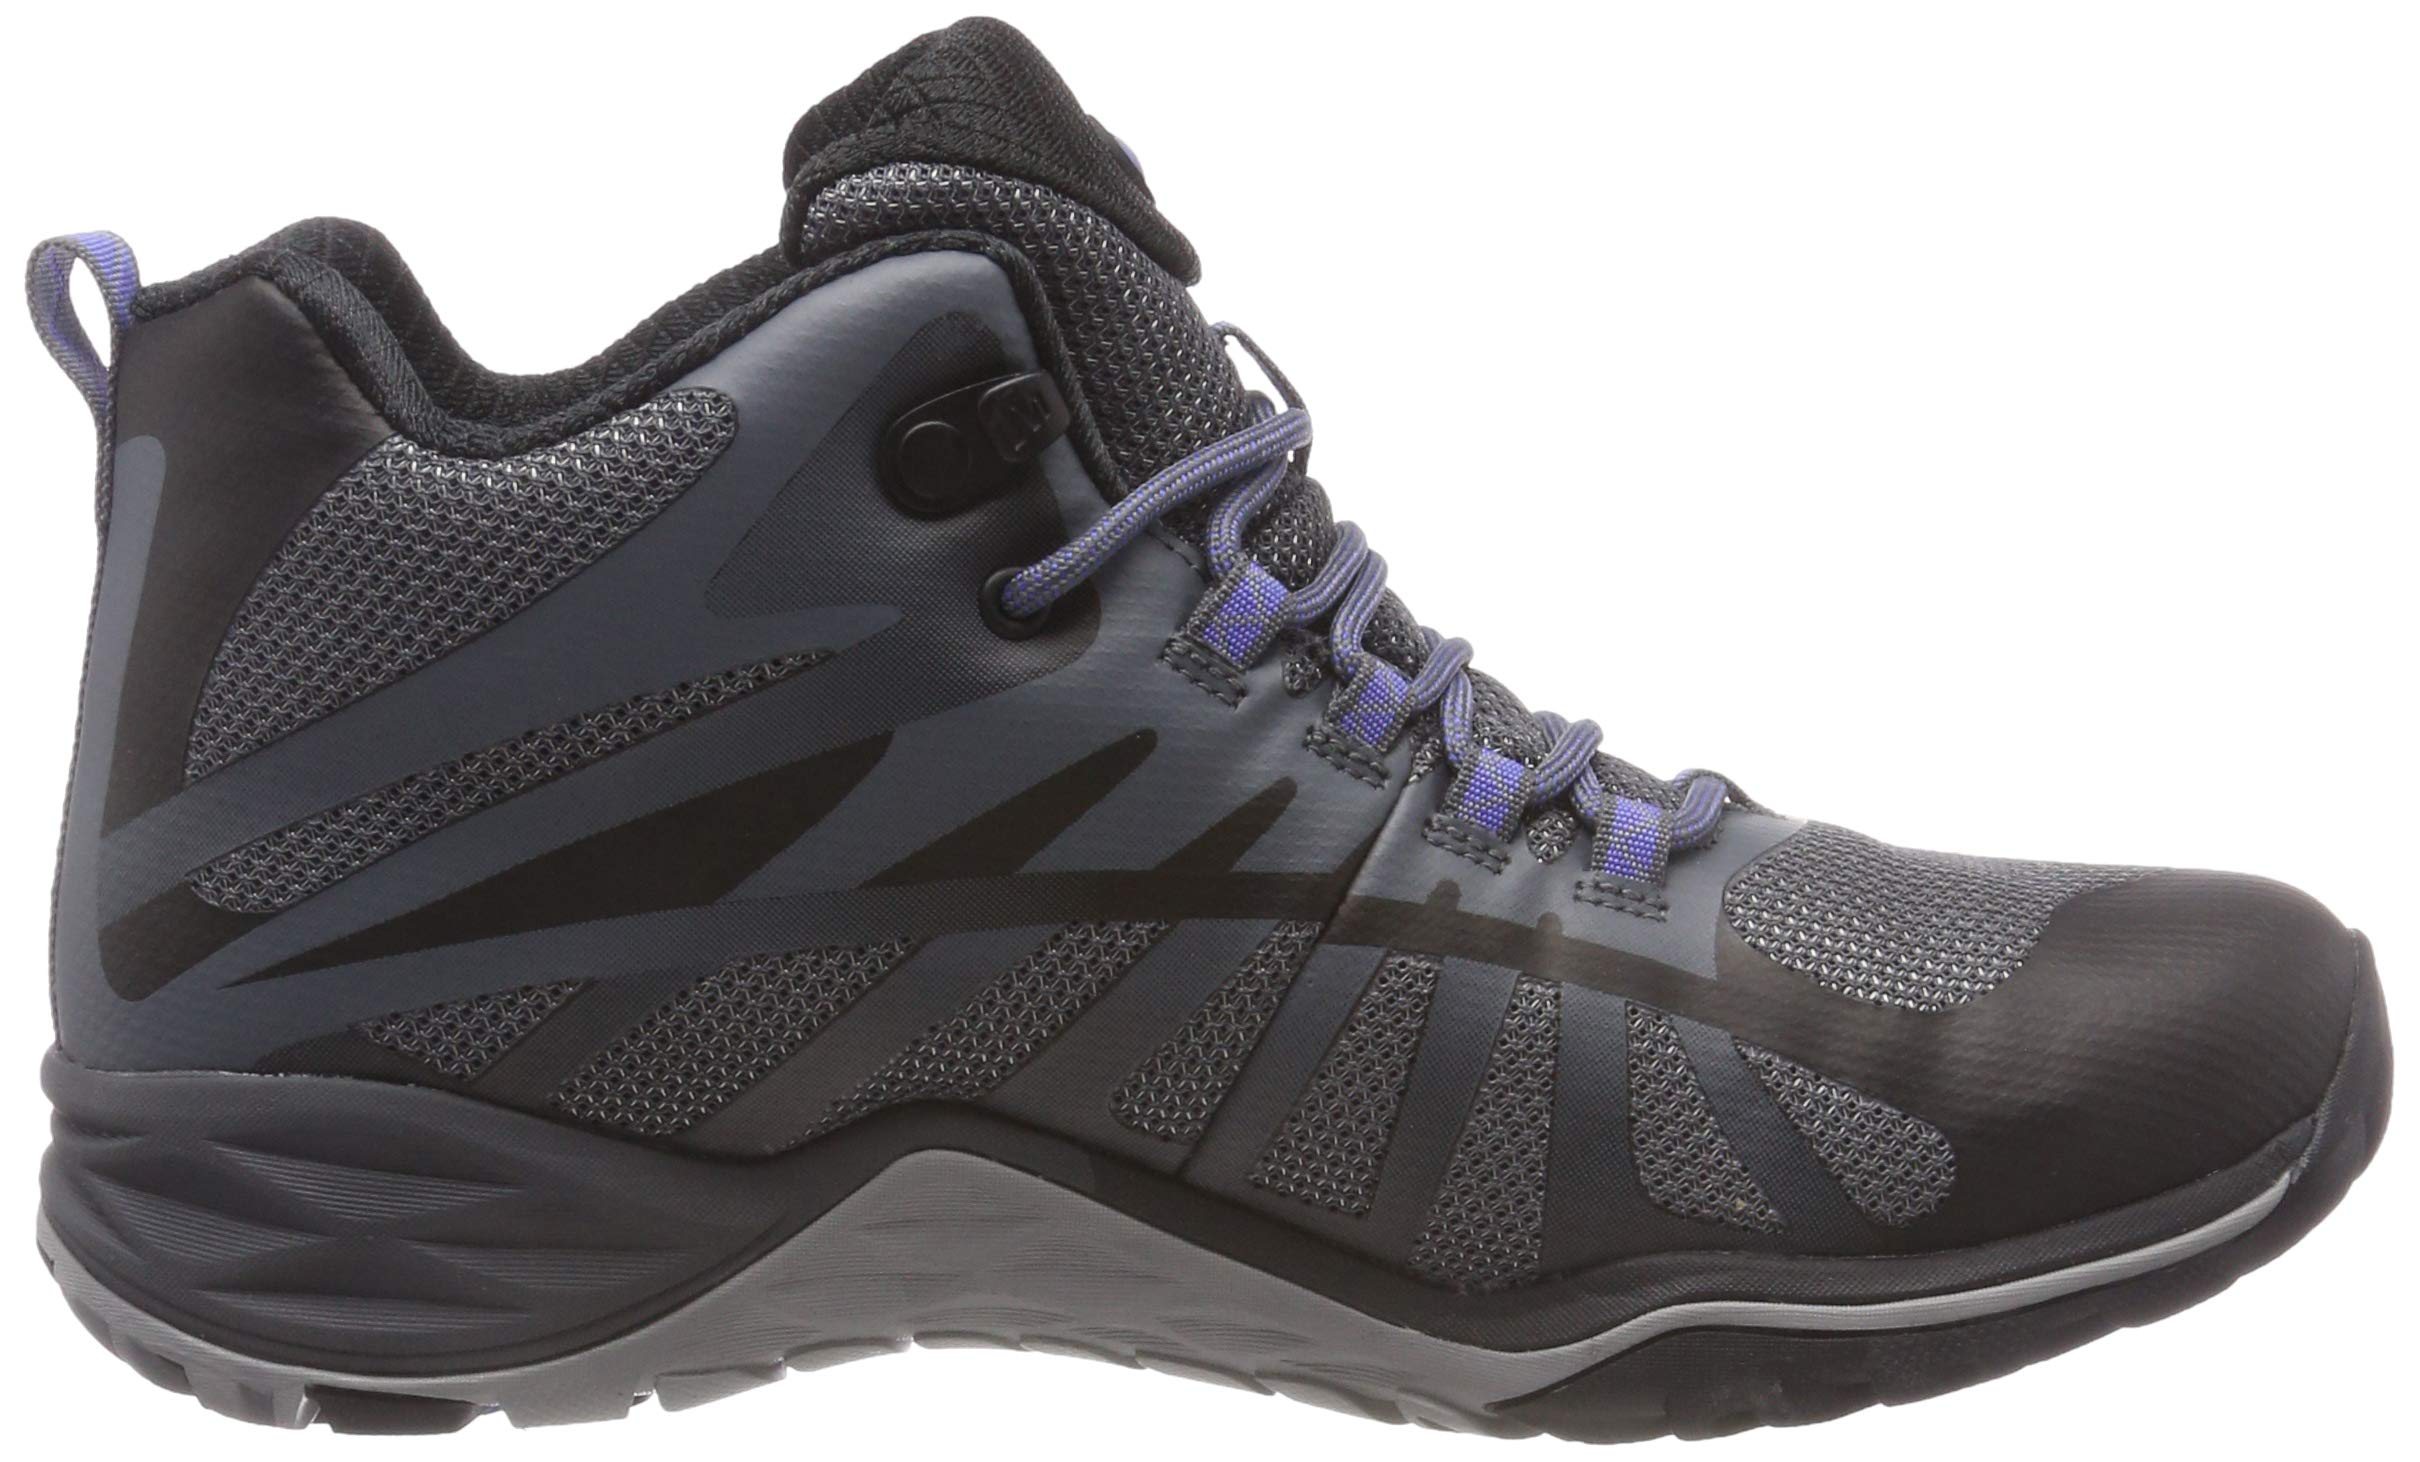 81jpoJI 7GL - Merrell Women's Siren Edge Q2 Mid Wp High Rise Hiking Boots